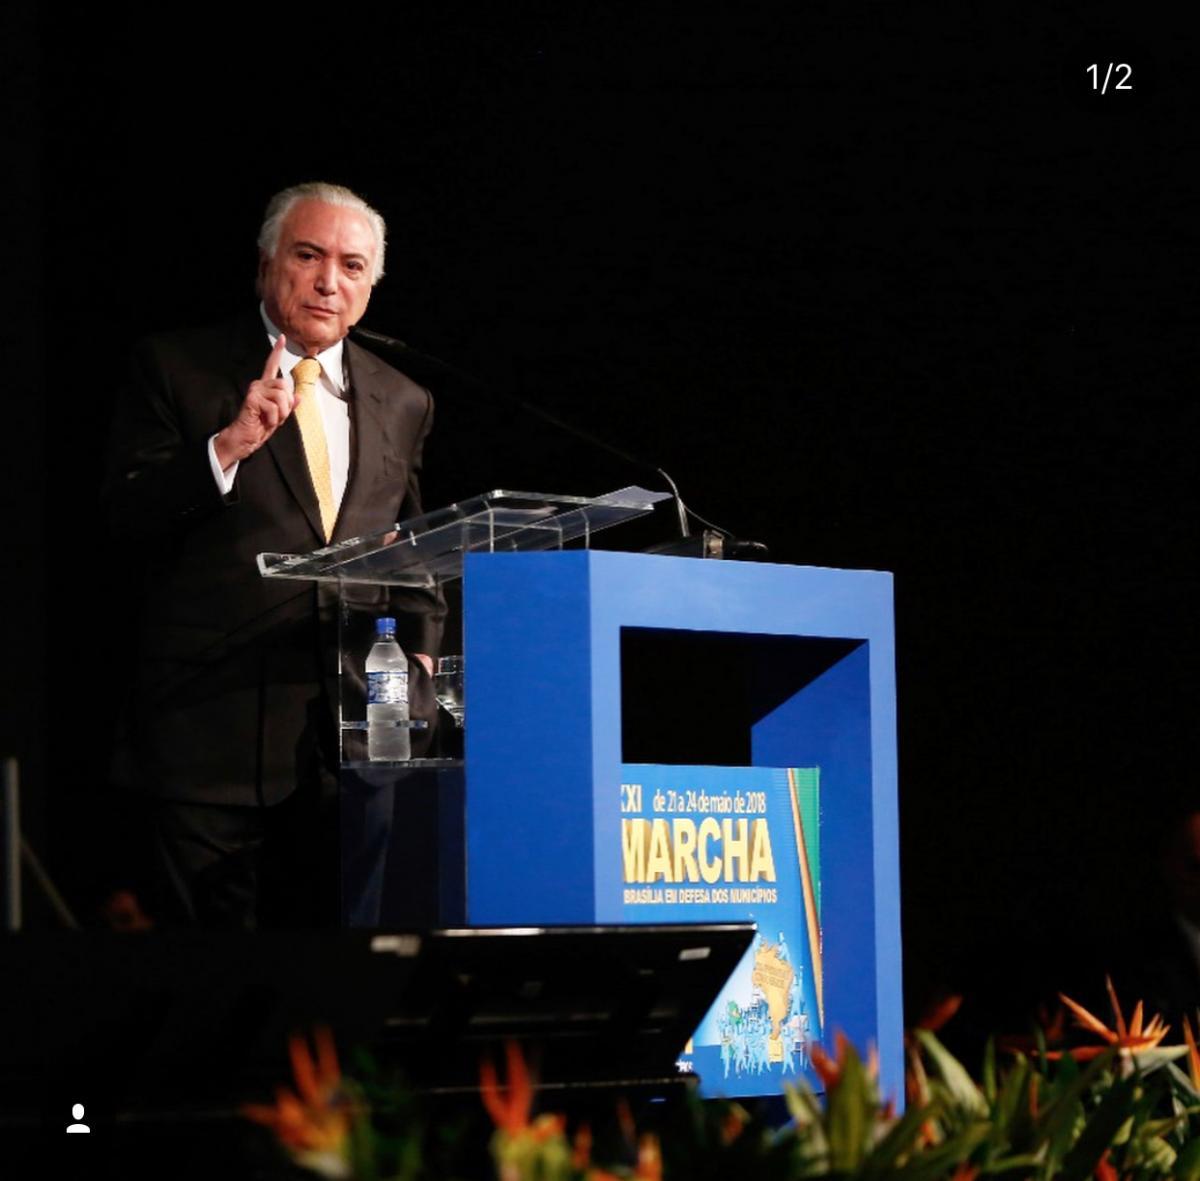 Presidente Michel Temer participa da marcha e assina decreto das UPAs